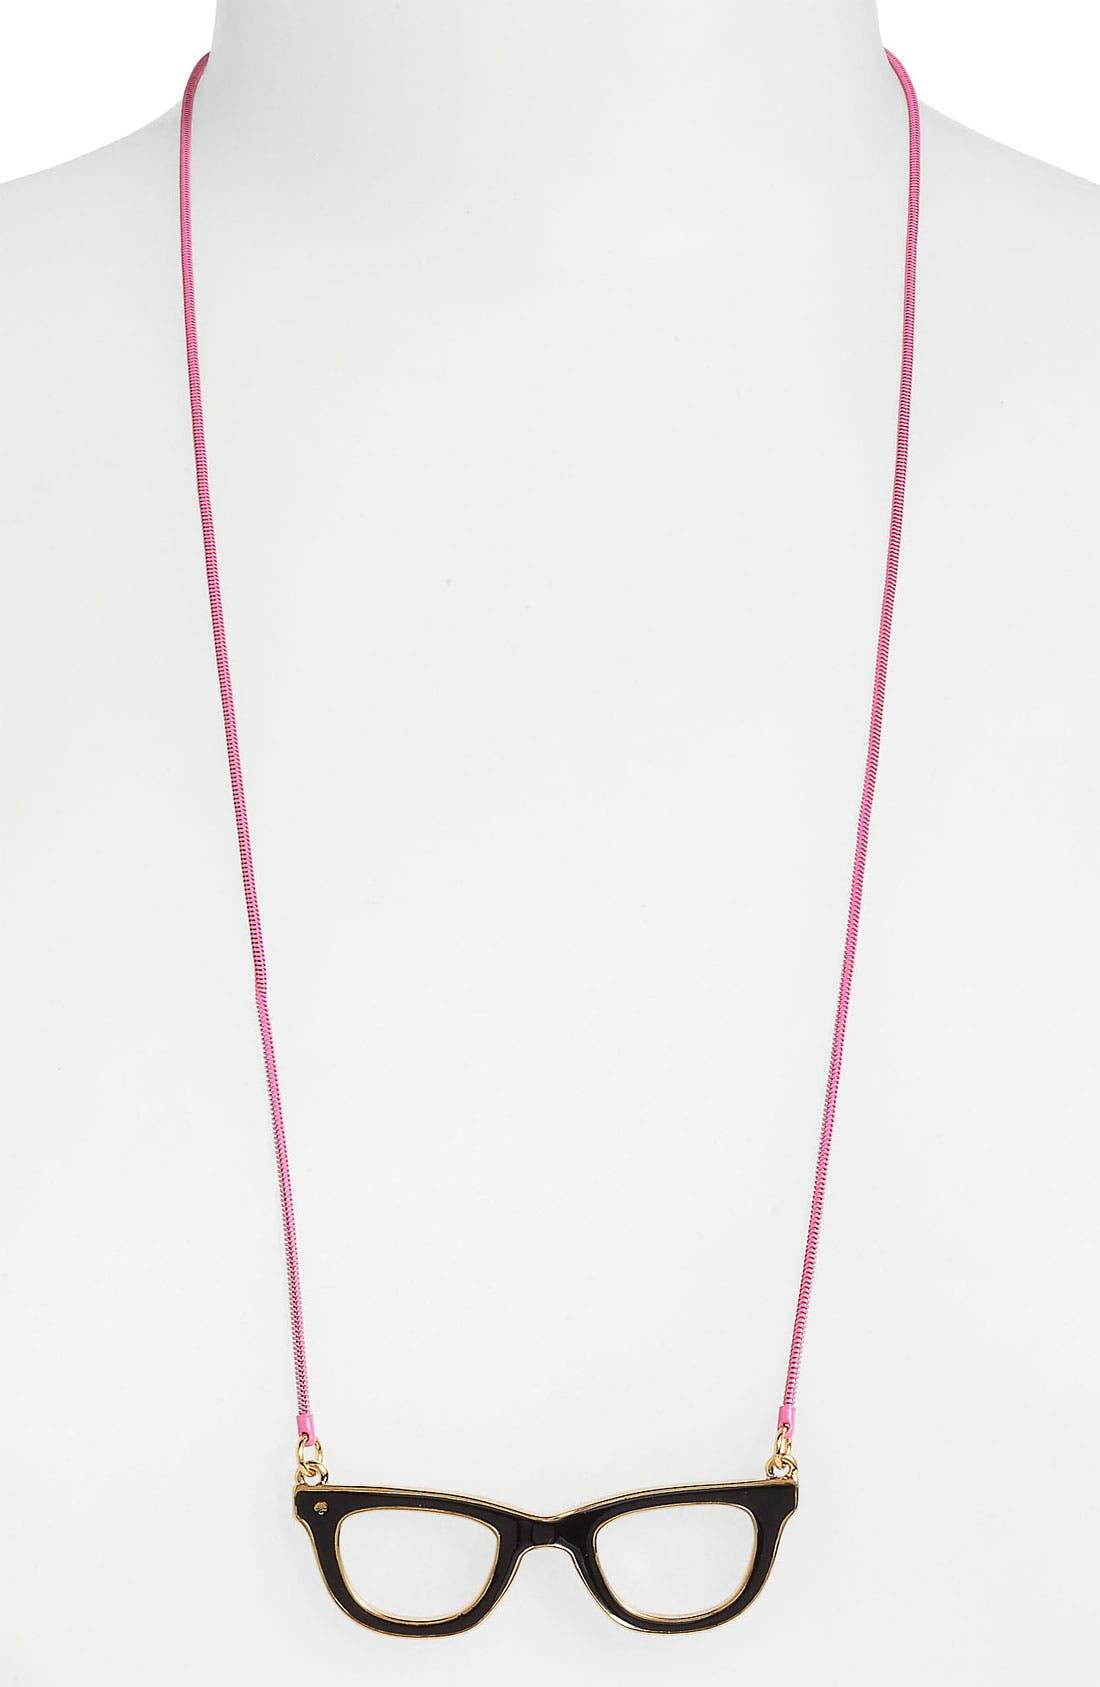 Main Image - kate spade new york 'goreski' reversible pendant necklace